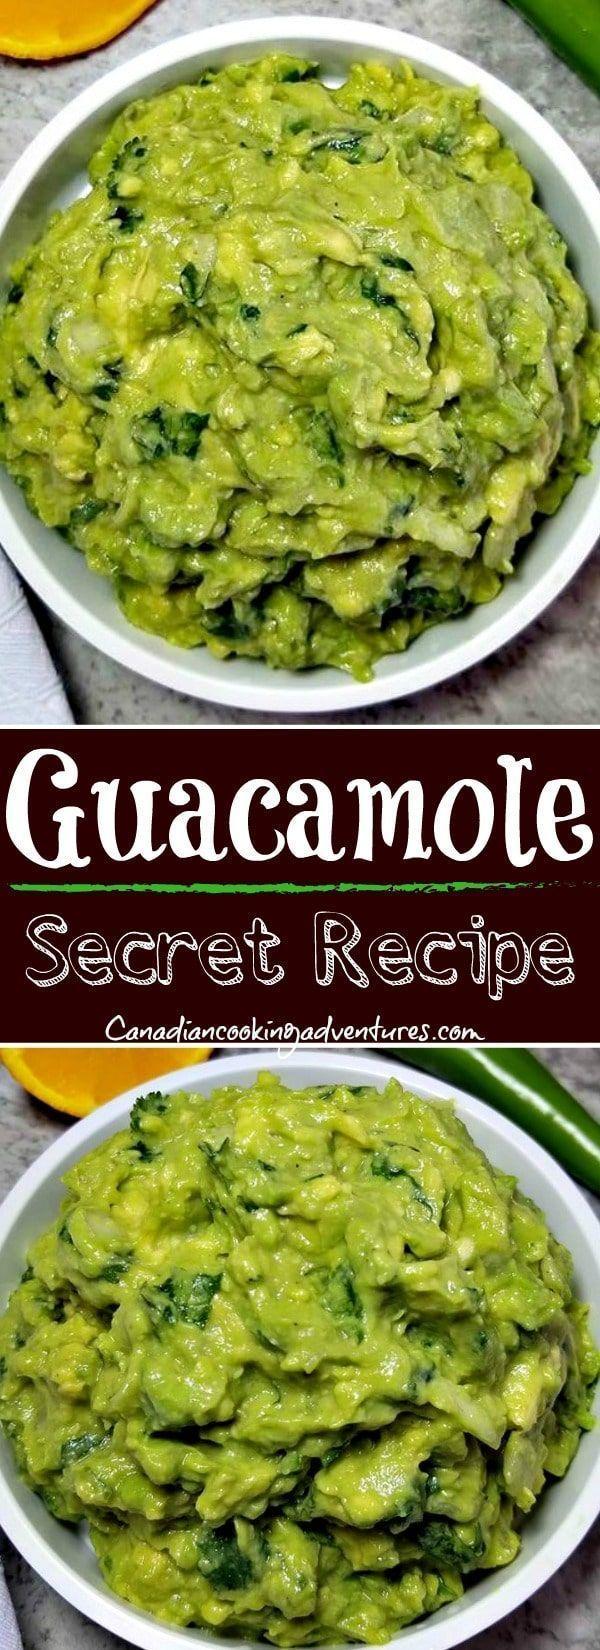 Best Homemade Guacamole Best Homemade Guacamole (SECRET INGREDIENT)#Canadiancookingadventures